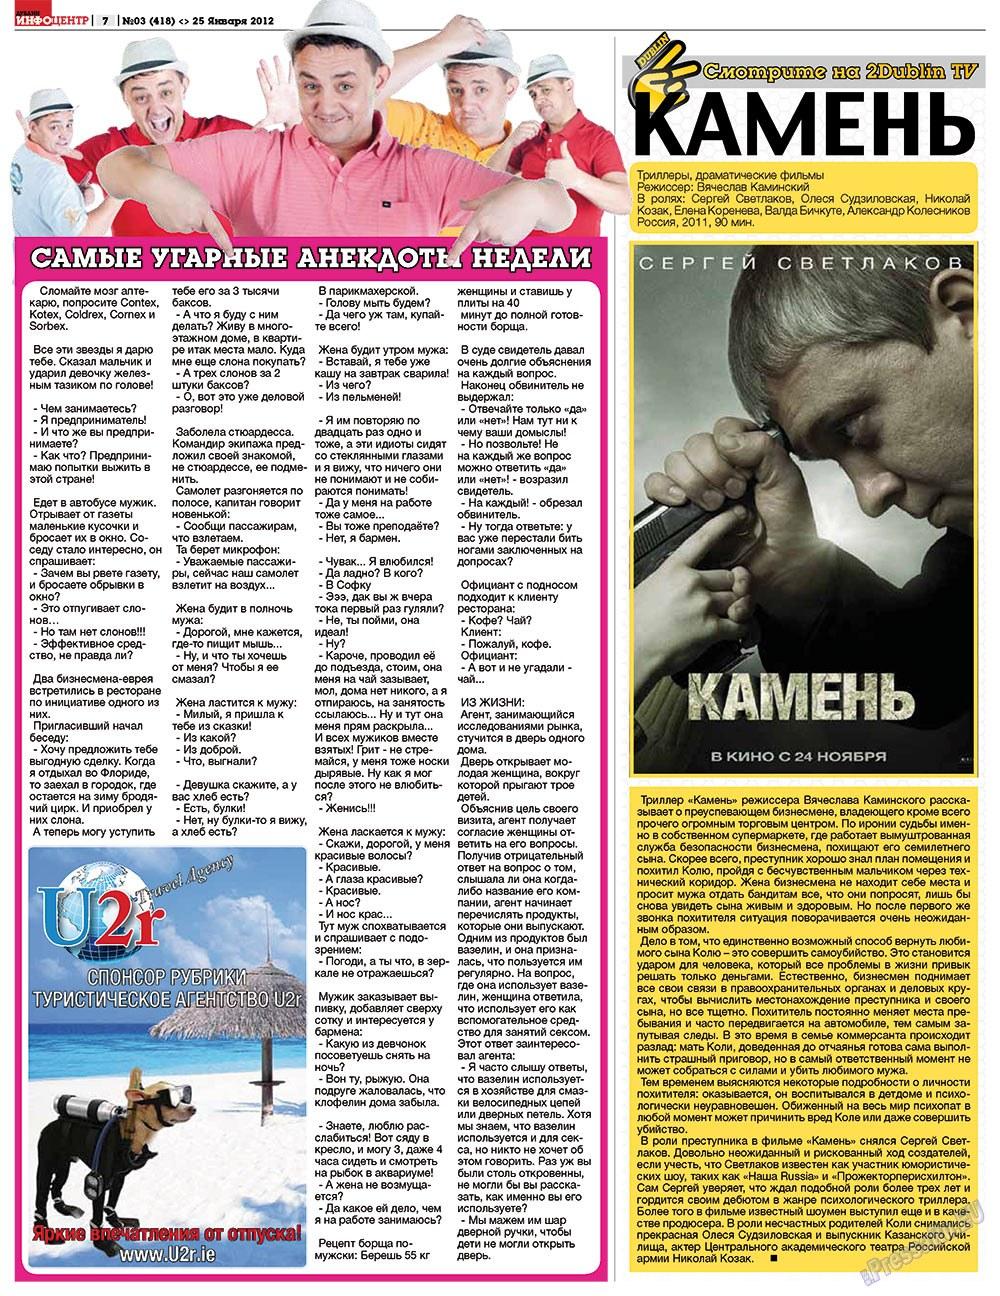 Дублин инфоцентр (газета). 2012 год, номер 3, стр. 7